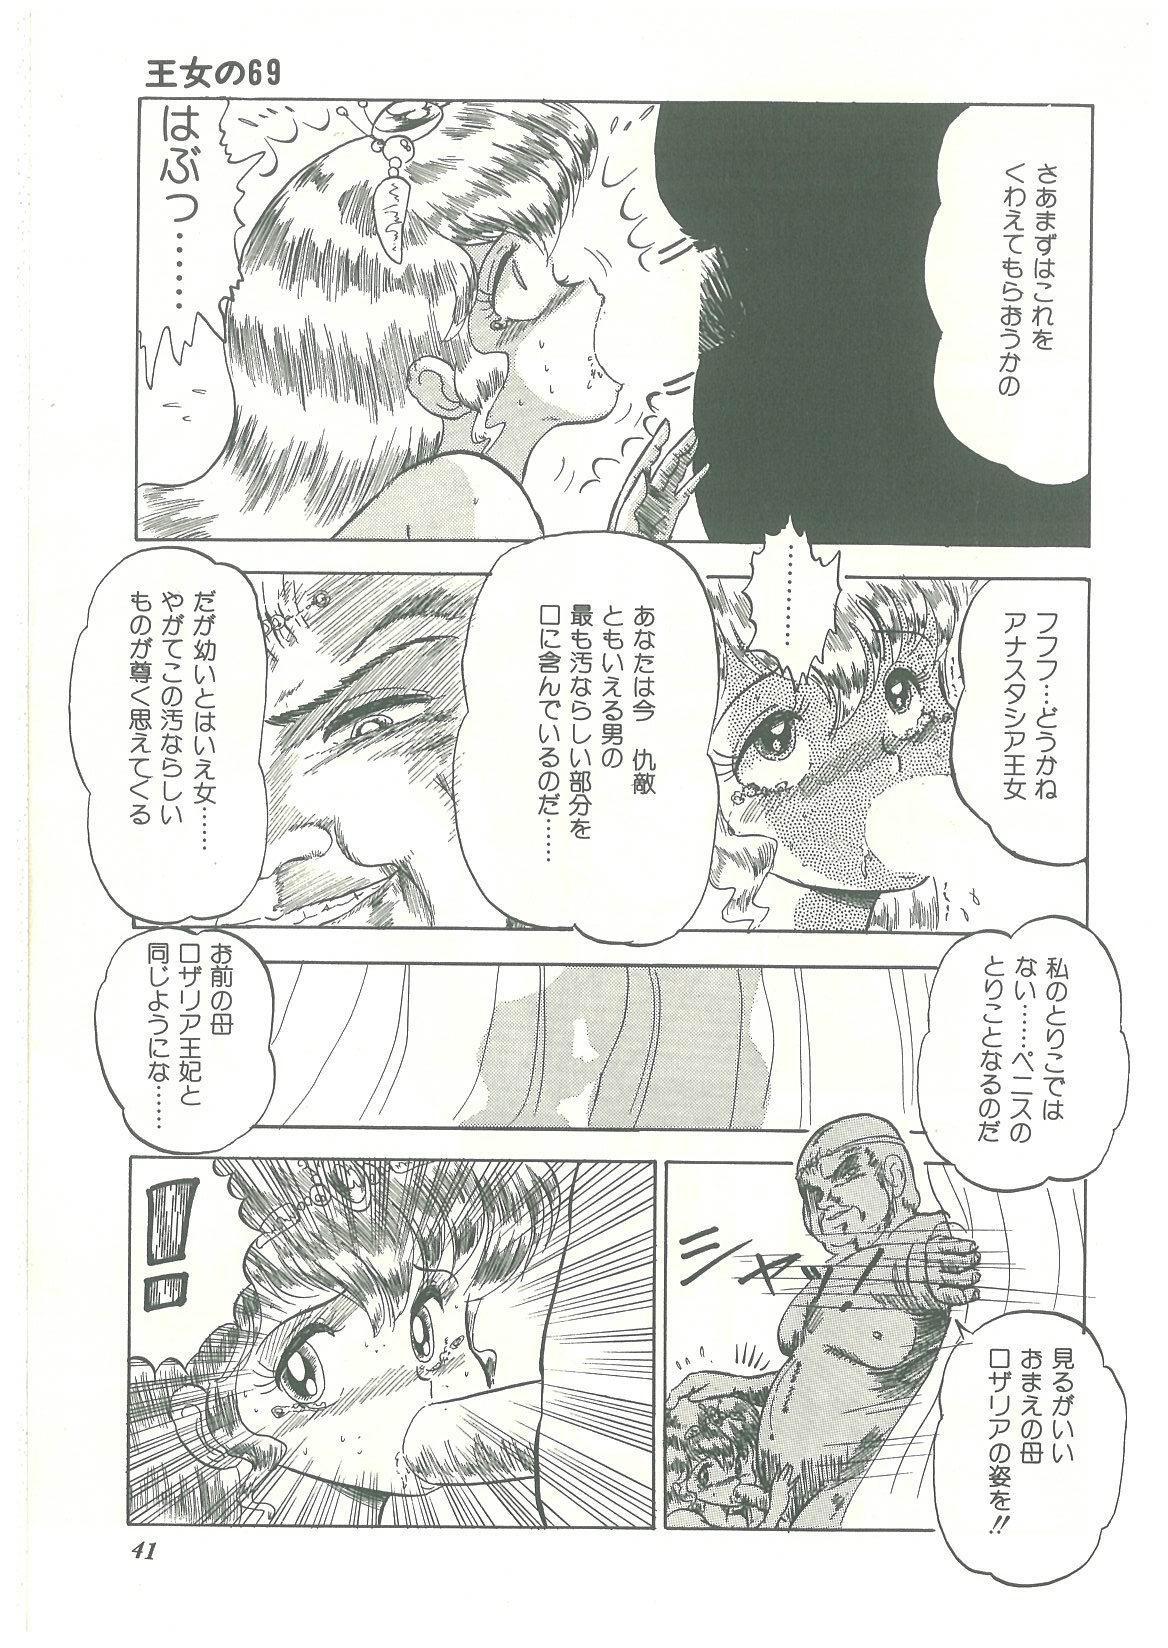 Lolikko Kiss 38